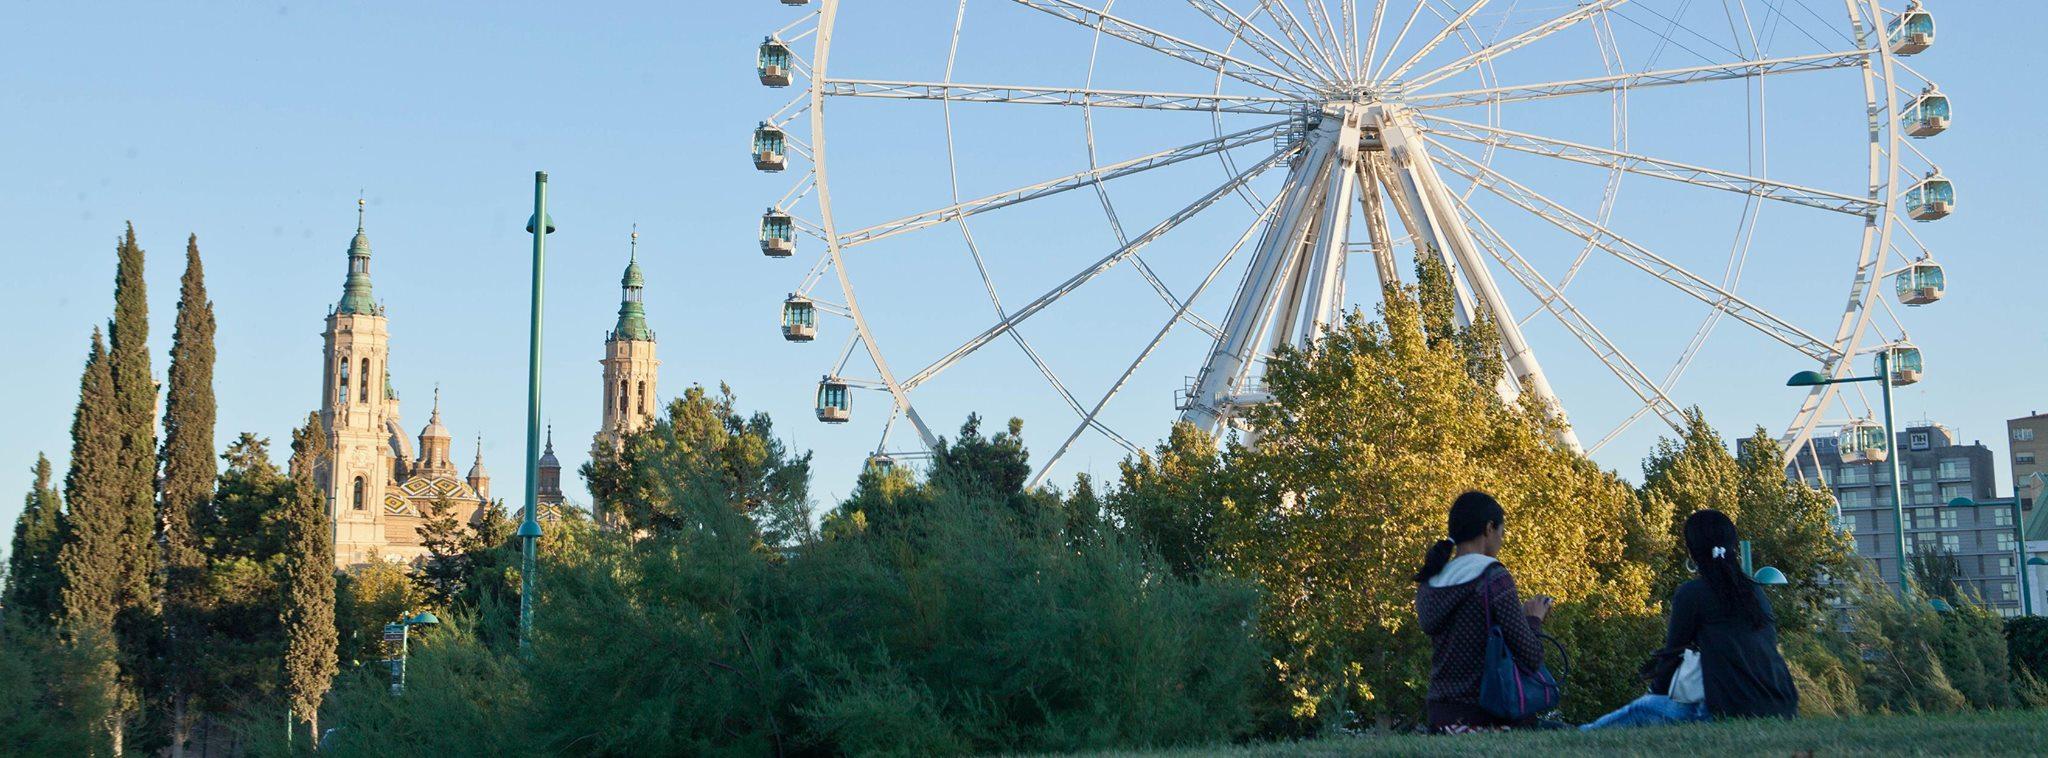 Ferias En Zaragoza